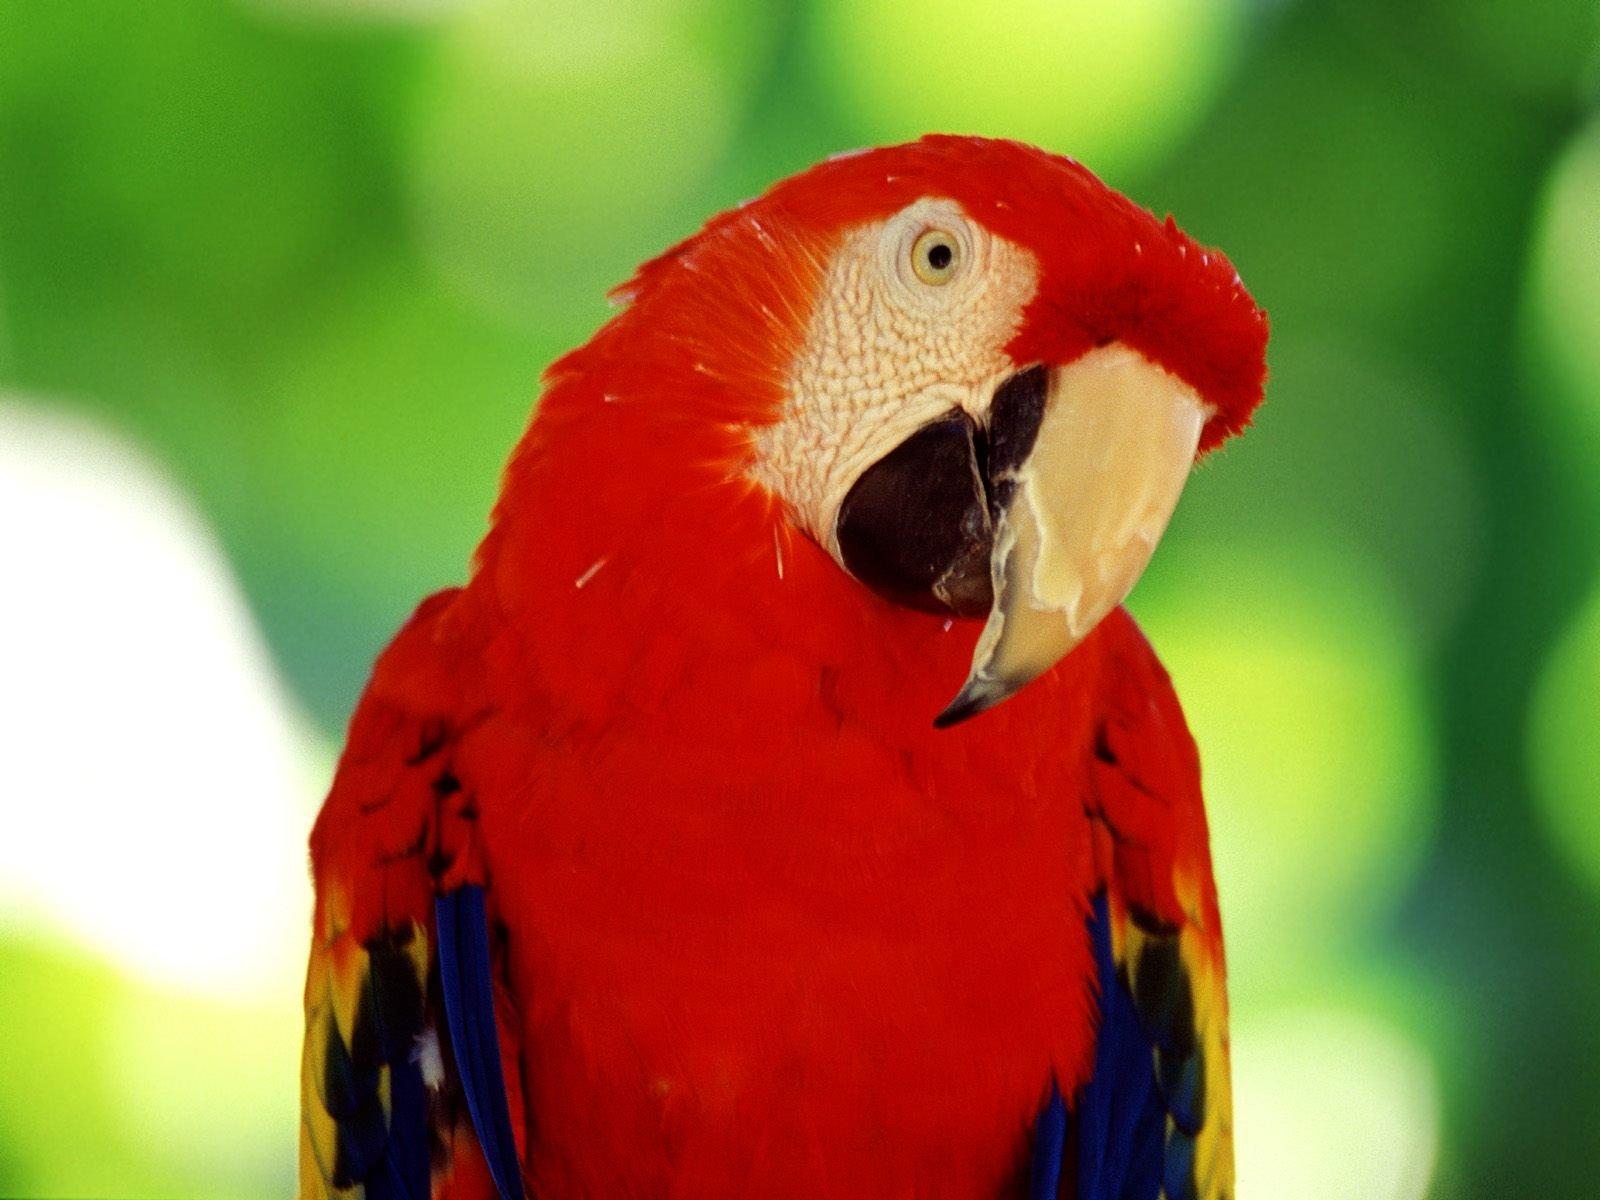 parrots wallpaper bird - photo #13